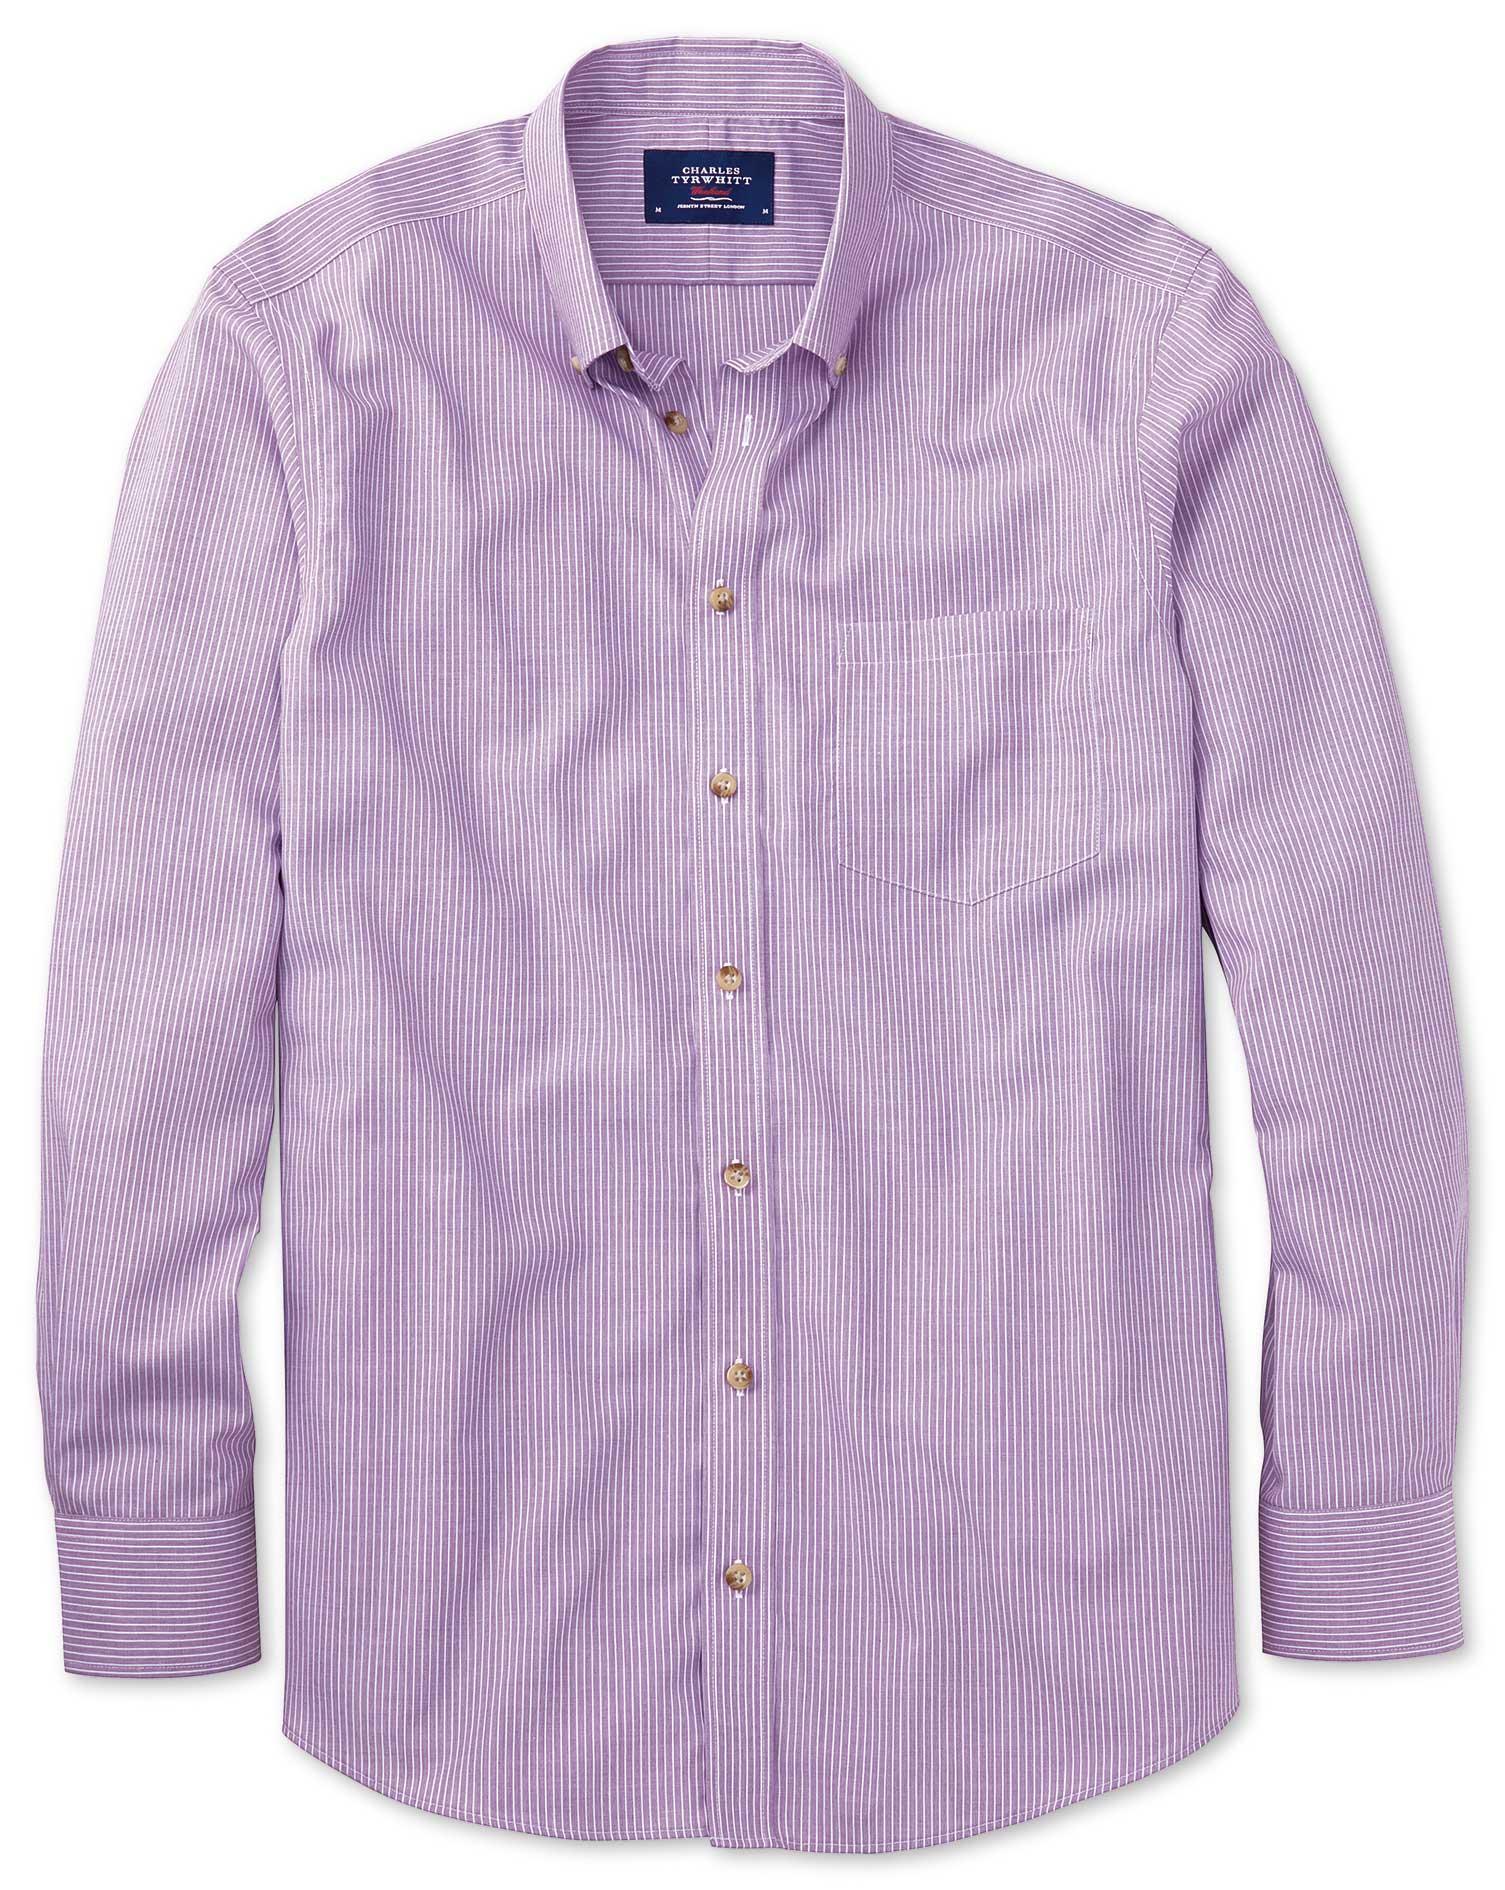 Extra Slim Fit Non-Iron Poplin Lilac Stripe Cotton Shirt Single Cuff Size Small by Charles Tyrwhitt